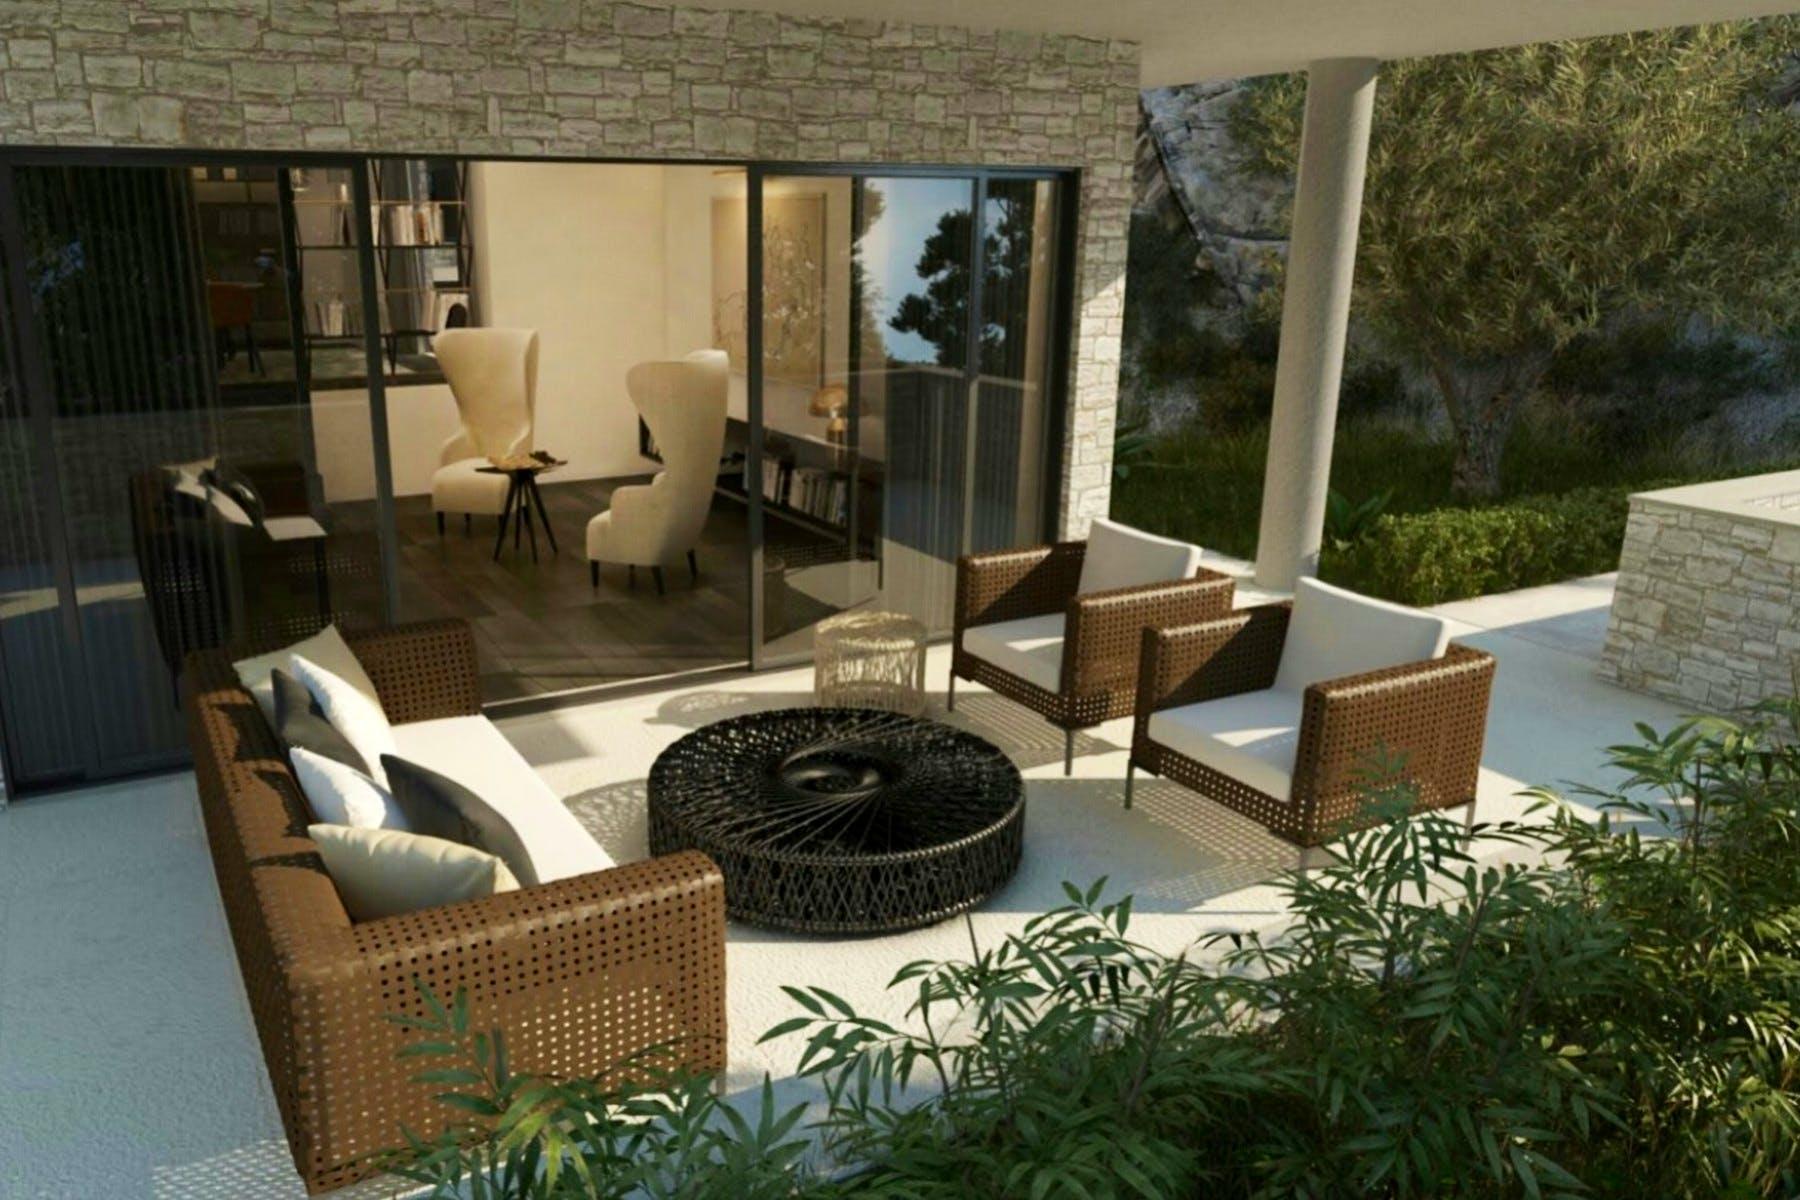 Interior design for a newly built property